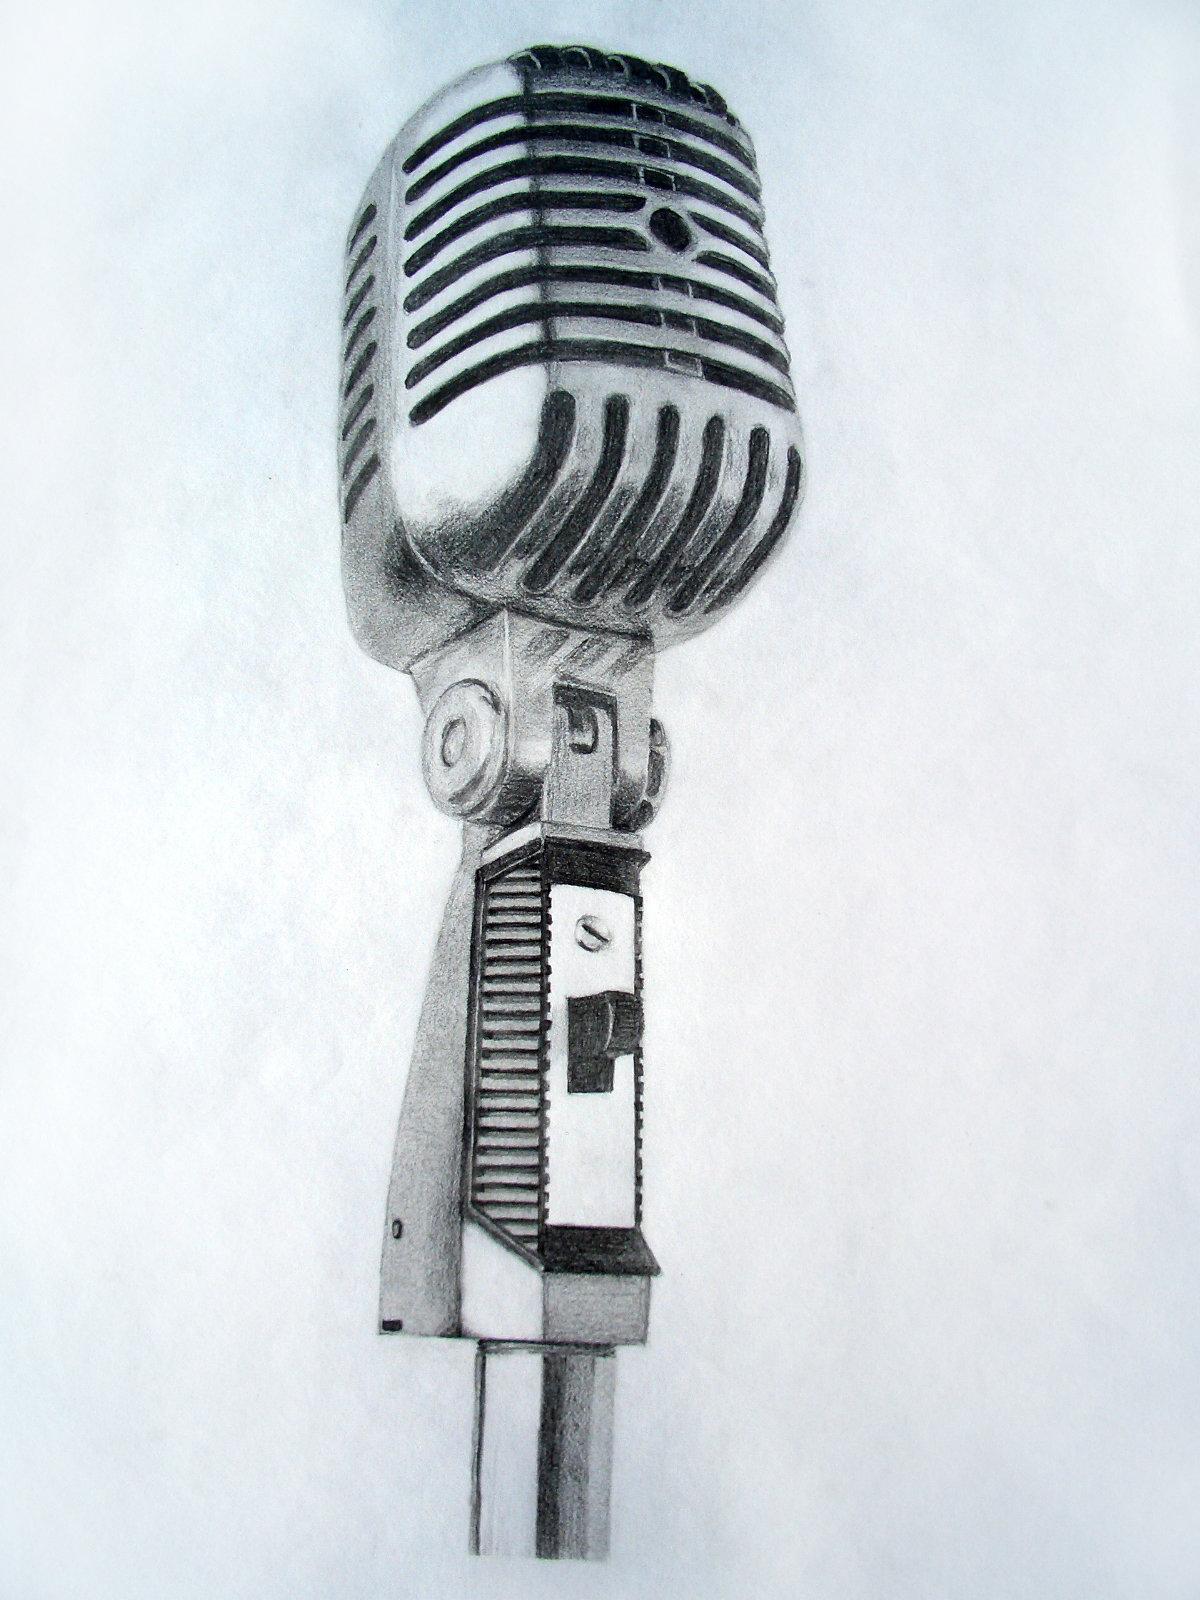 Drawn music retro microphone DeviantArt on Vintage Vintage by